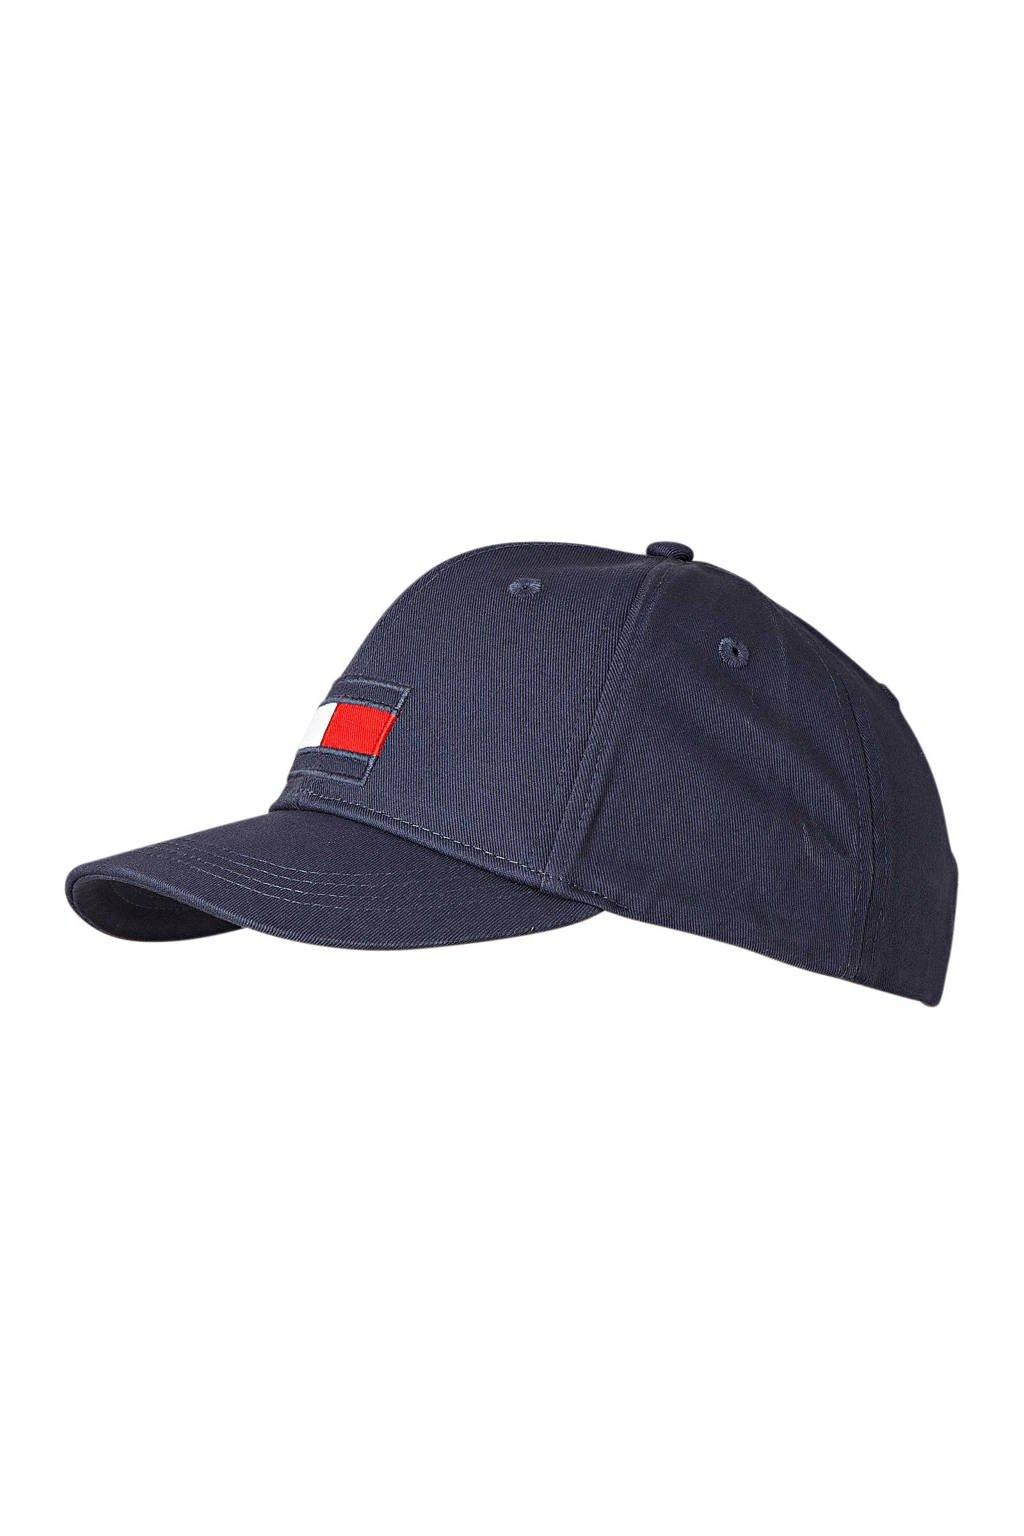 Tommy Hilfiger pet BIG FLAG CAP,marine, Marine